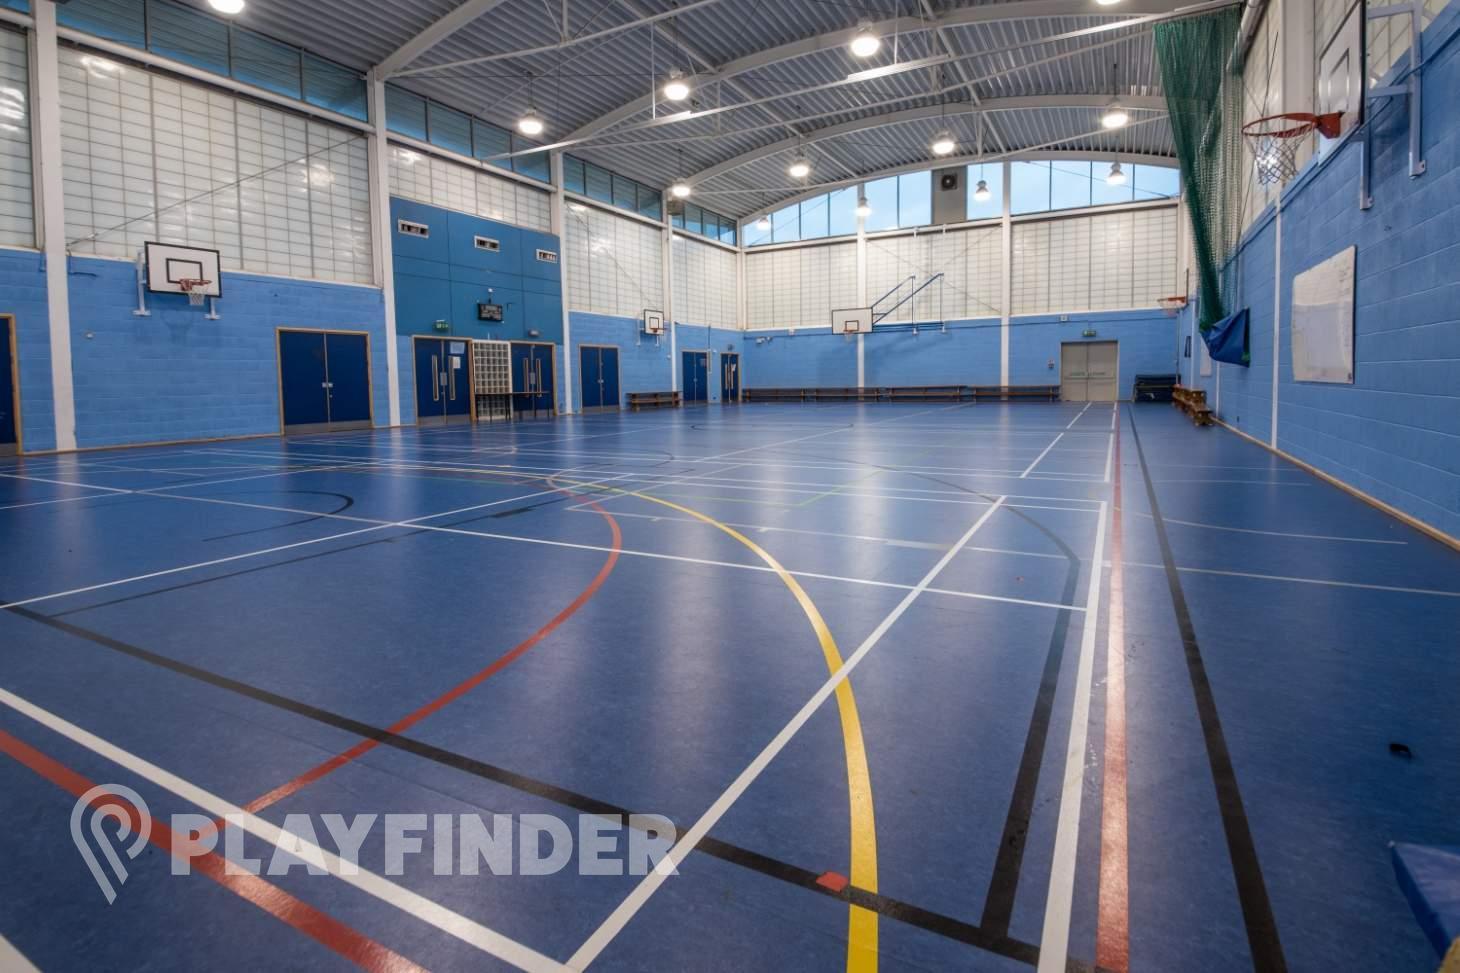 Ark Burlington Danes Academy Court | Sports hall netball court